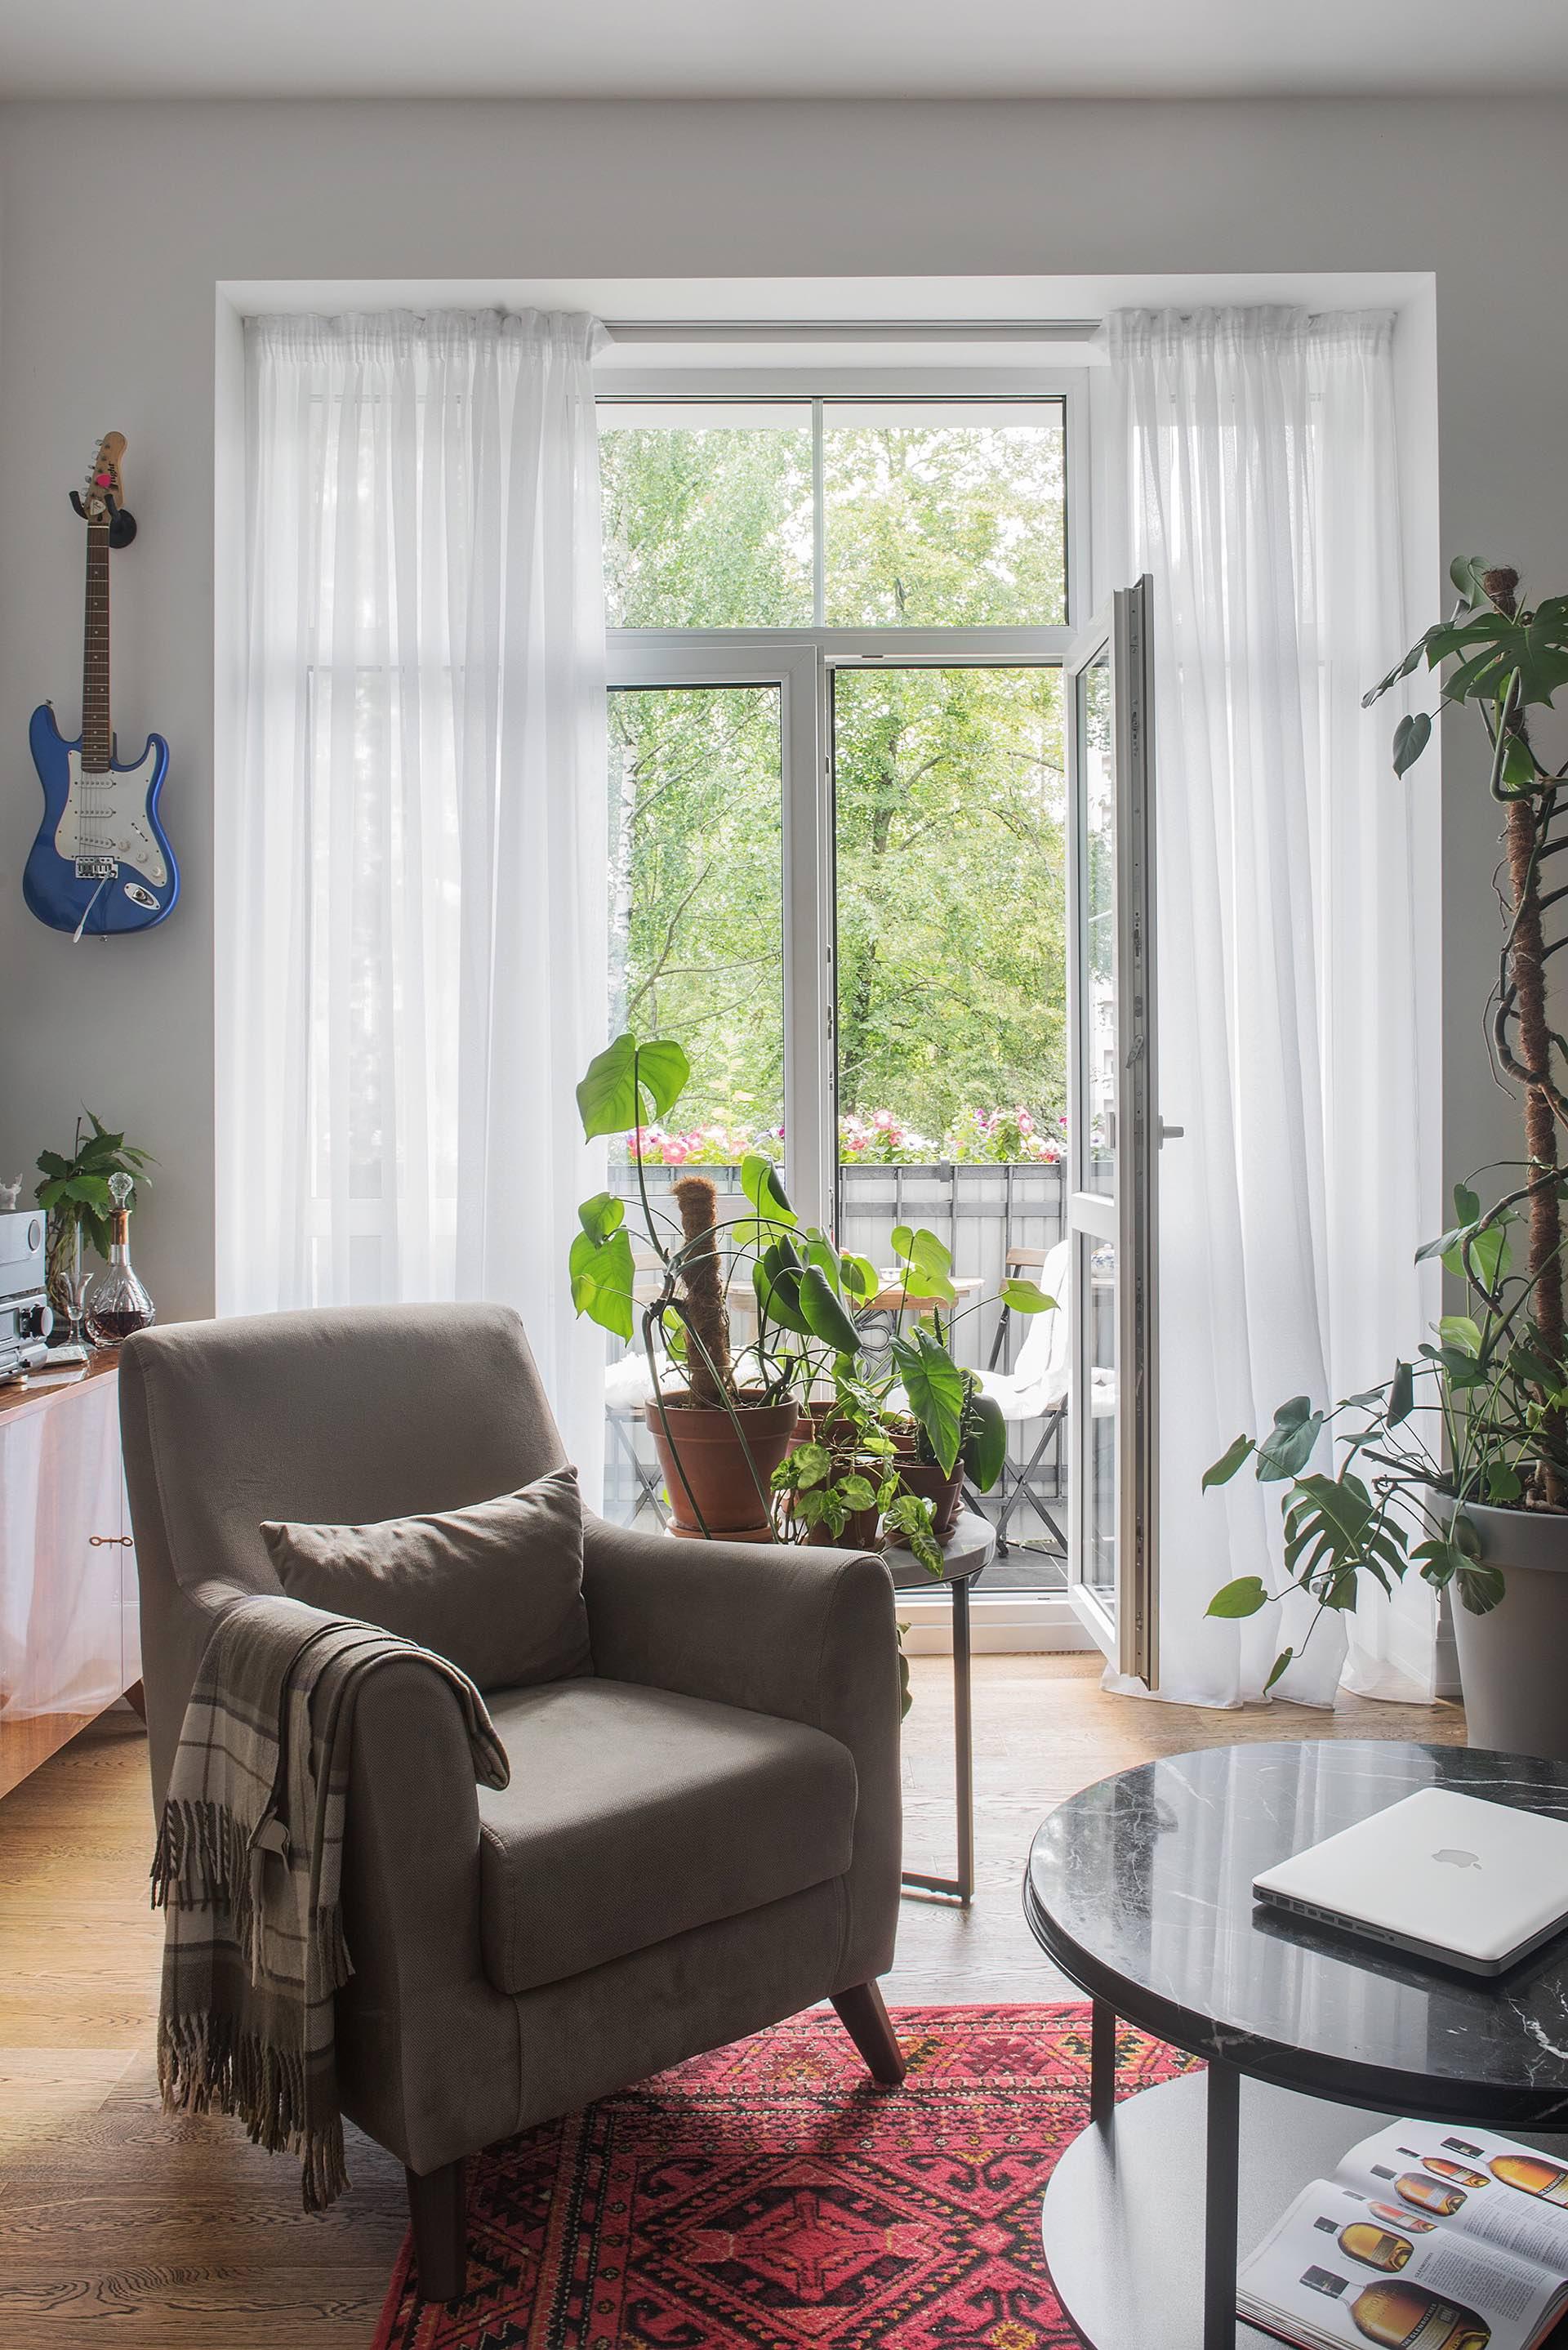 гостиная французские окна двери выход на балкон